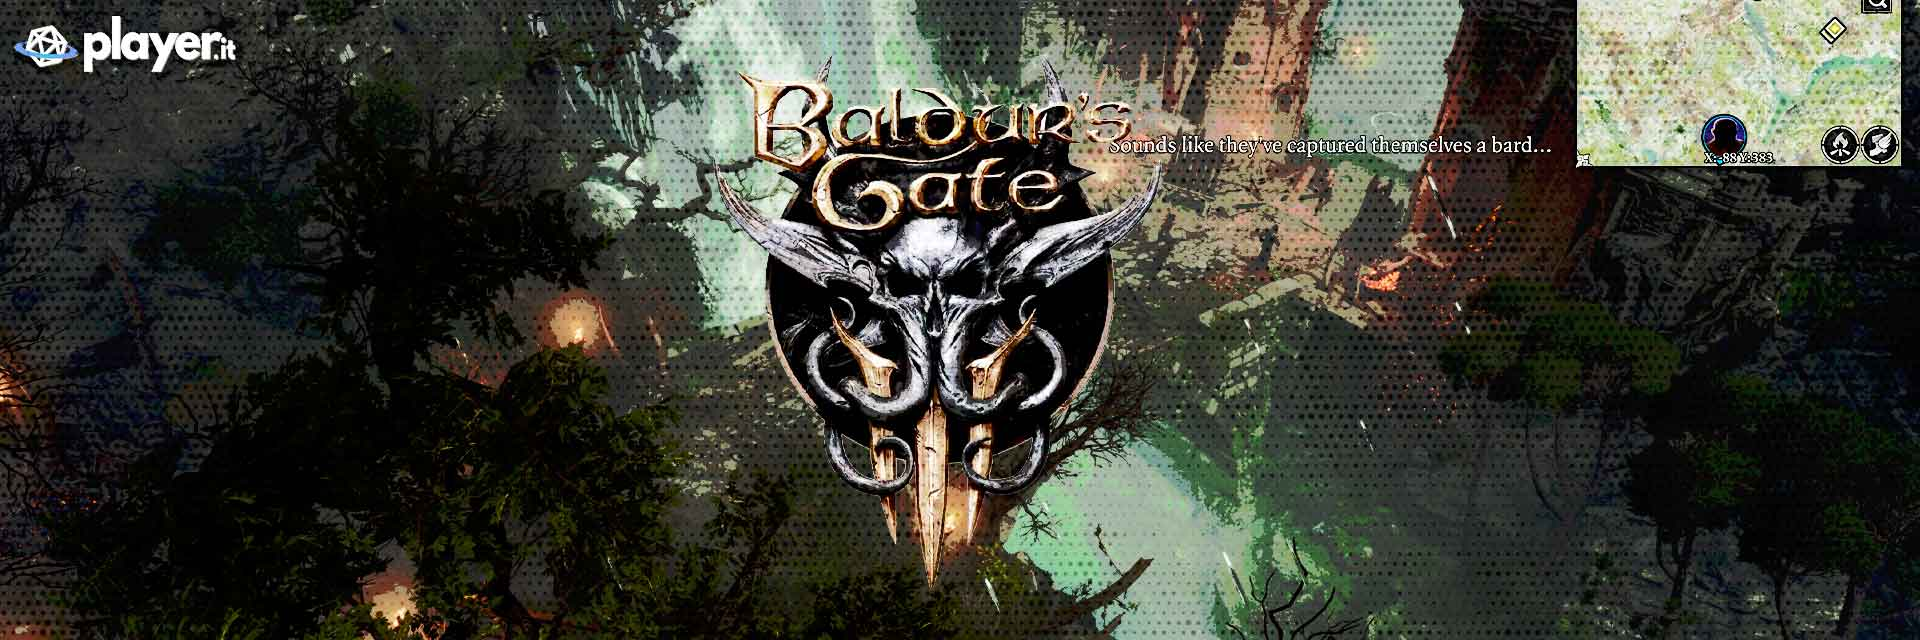 screenshots baldur s gate 3